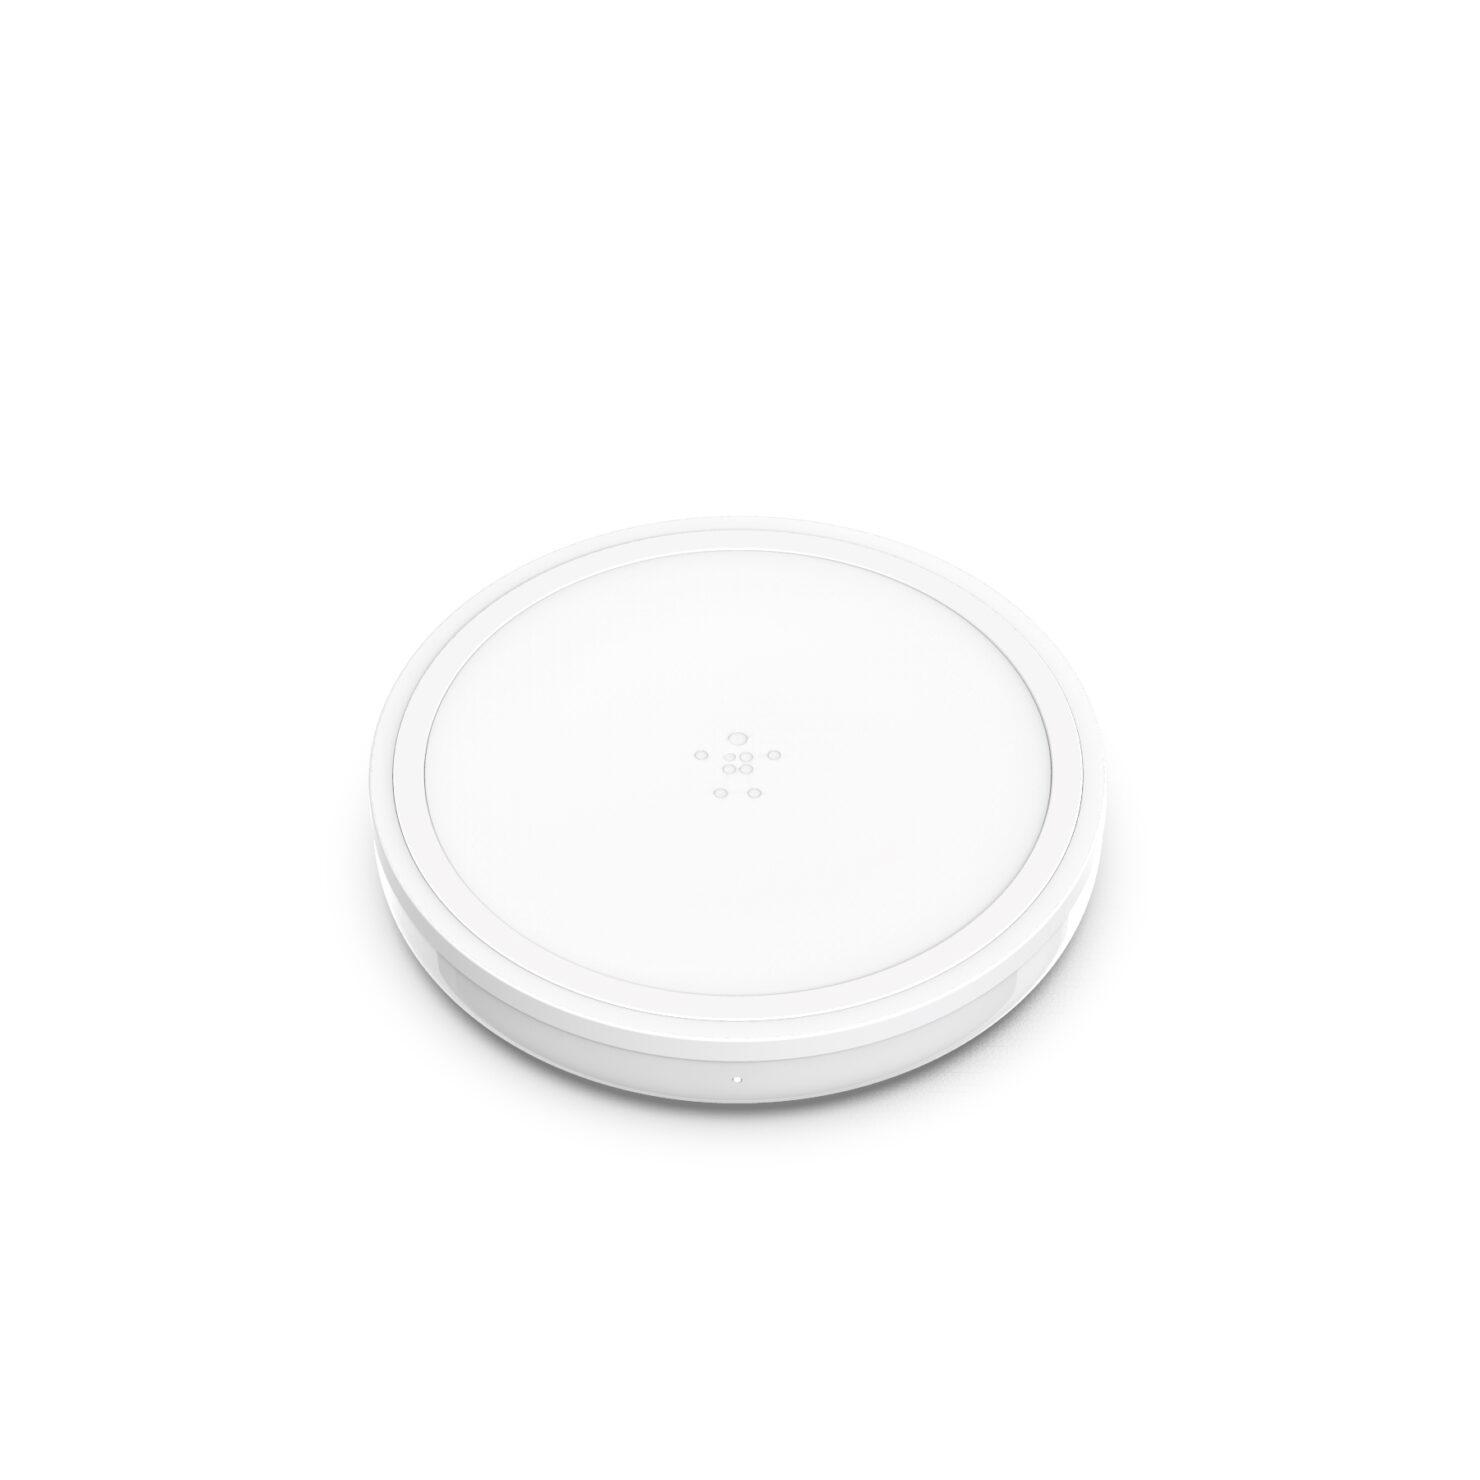 bold_charging_pad_product_1